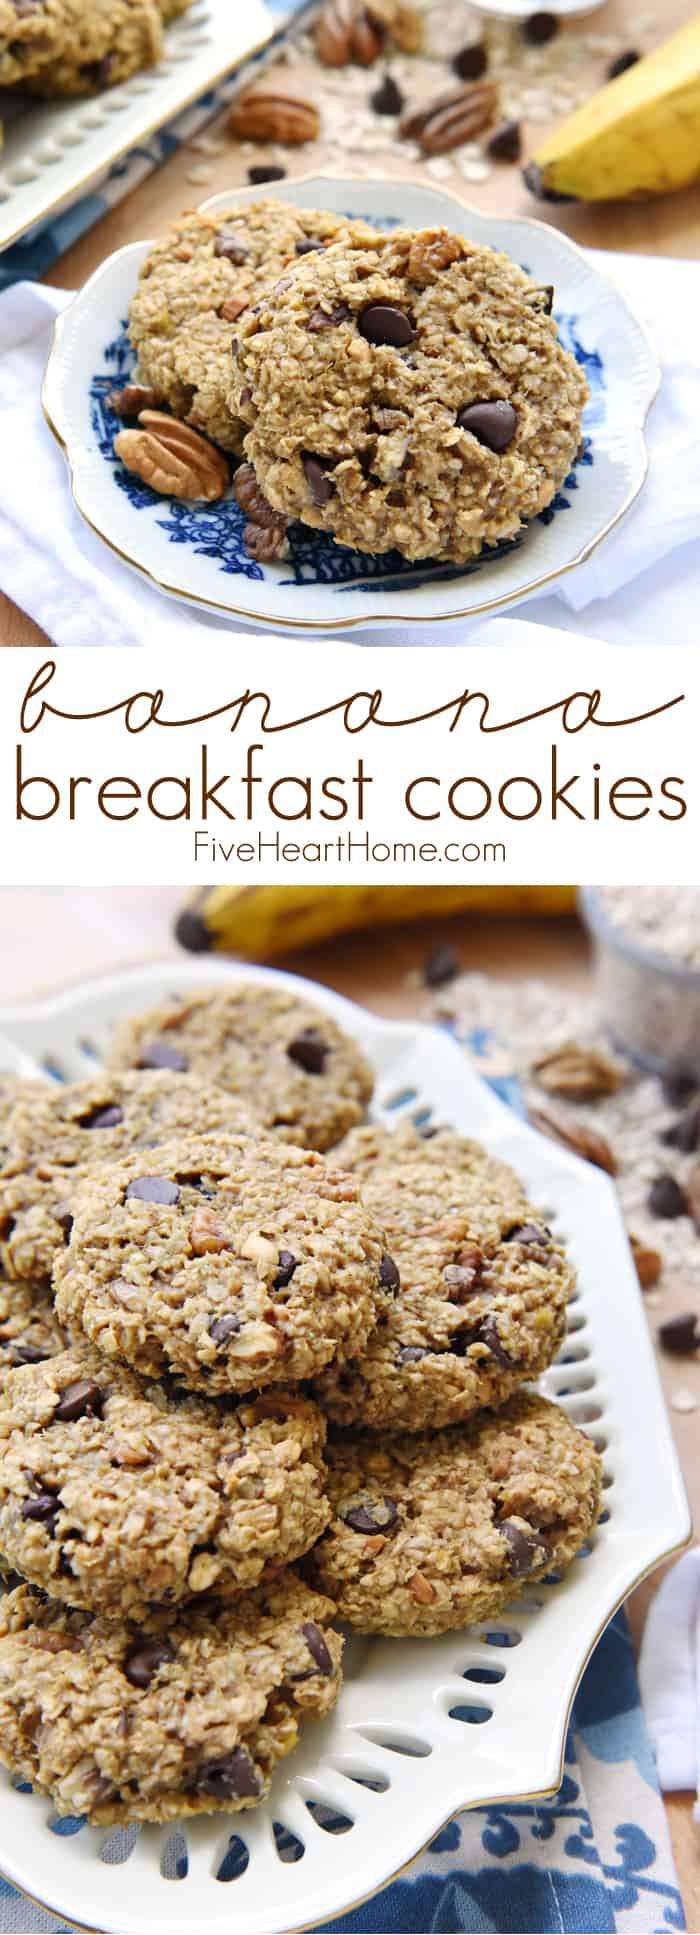 Breakfast Cookie Recipes  Banana Breakfast Cookies